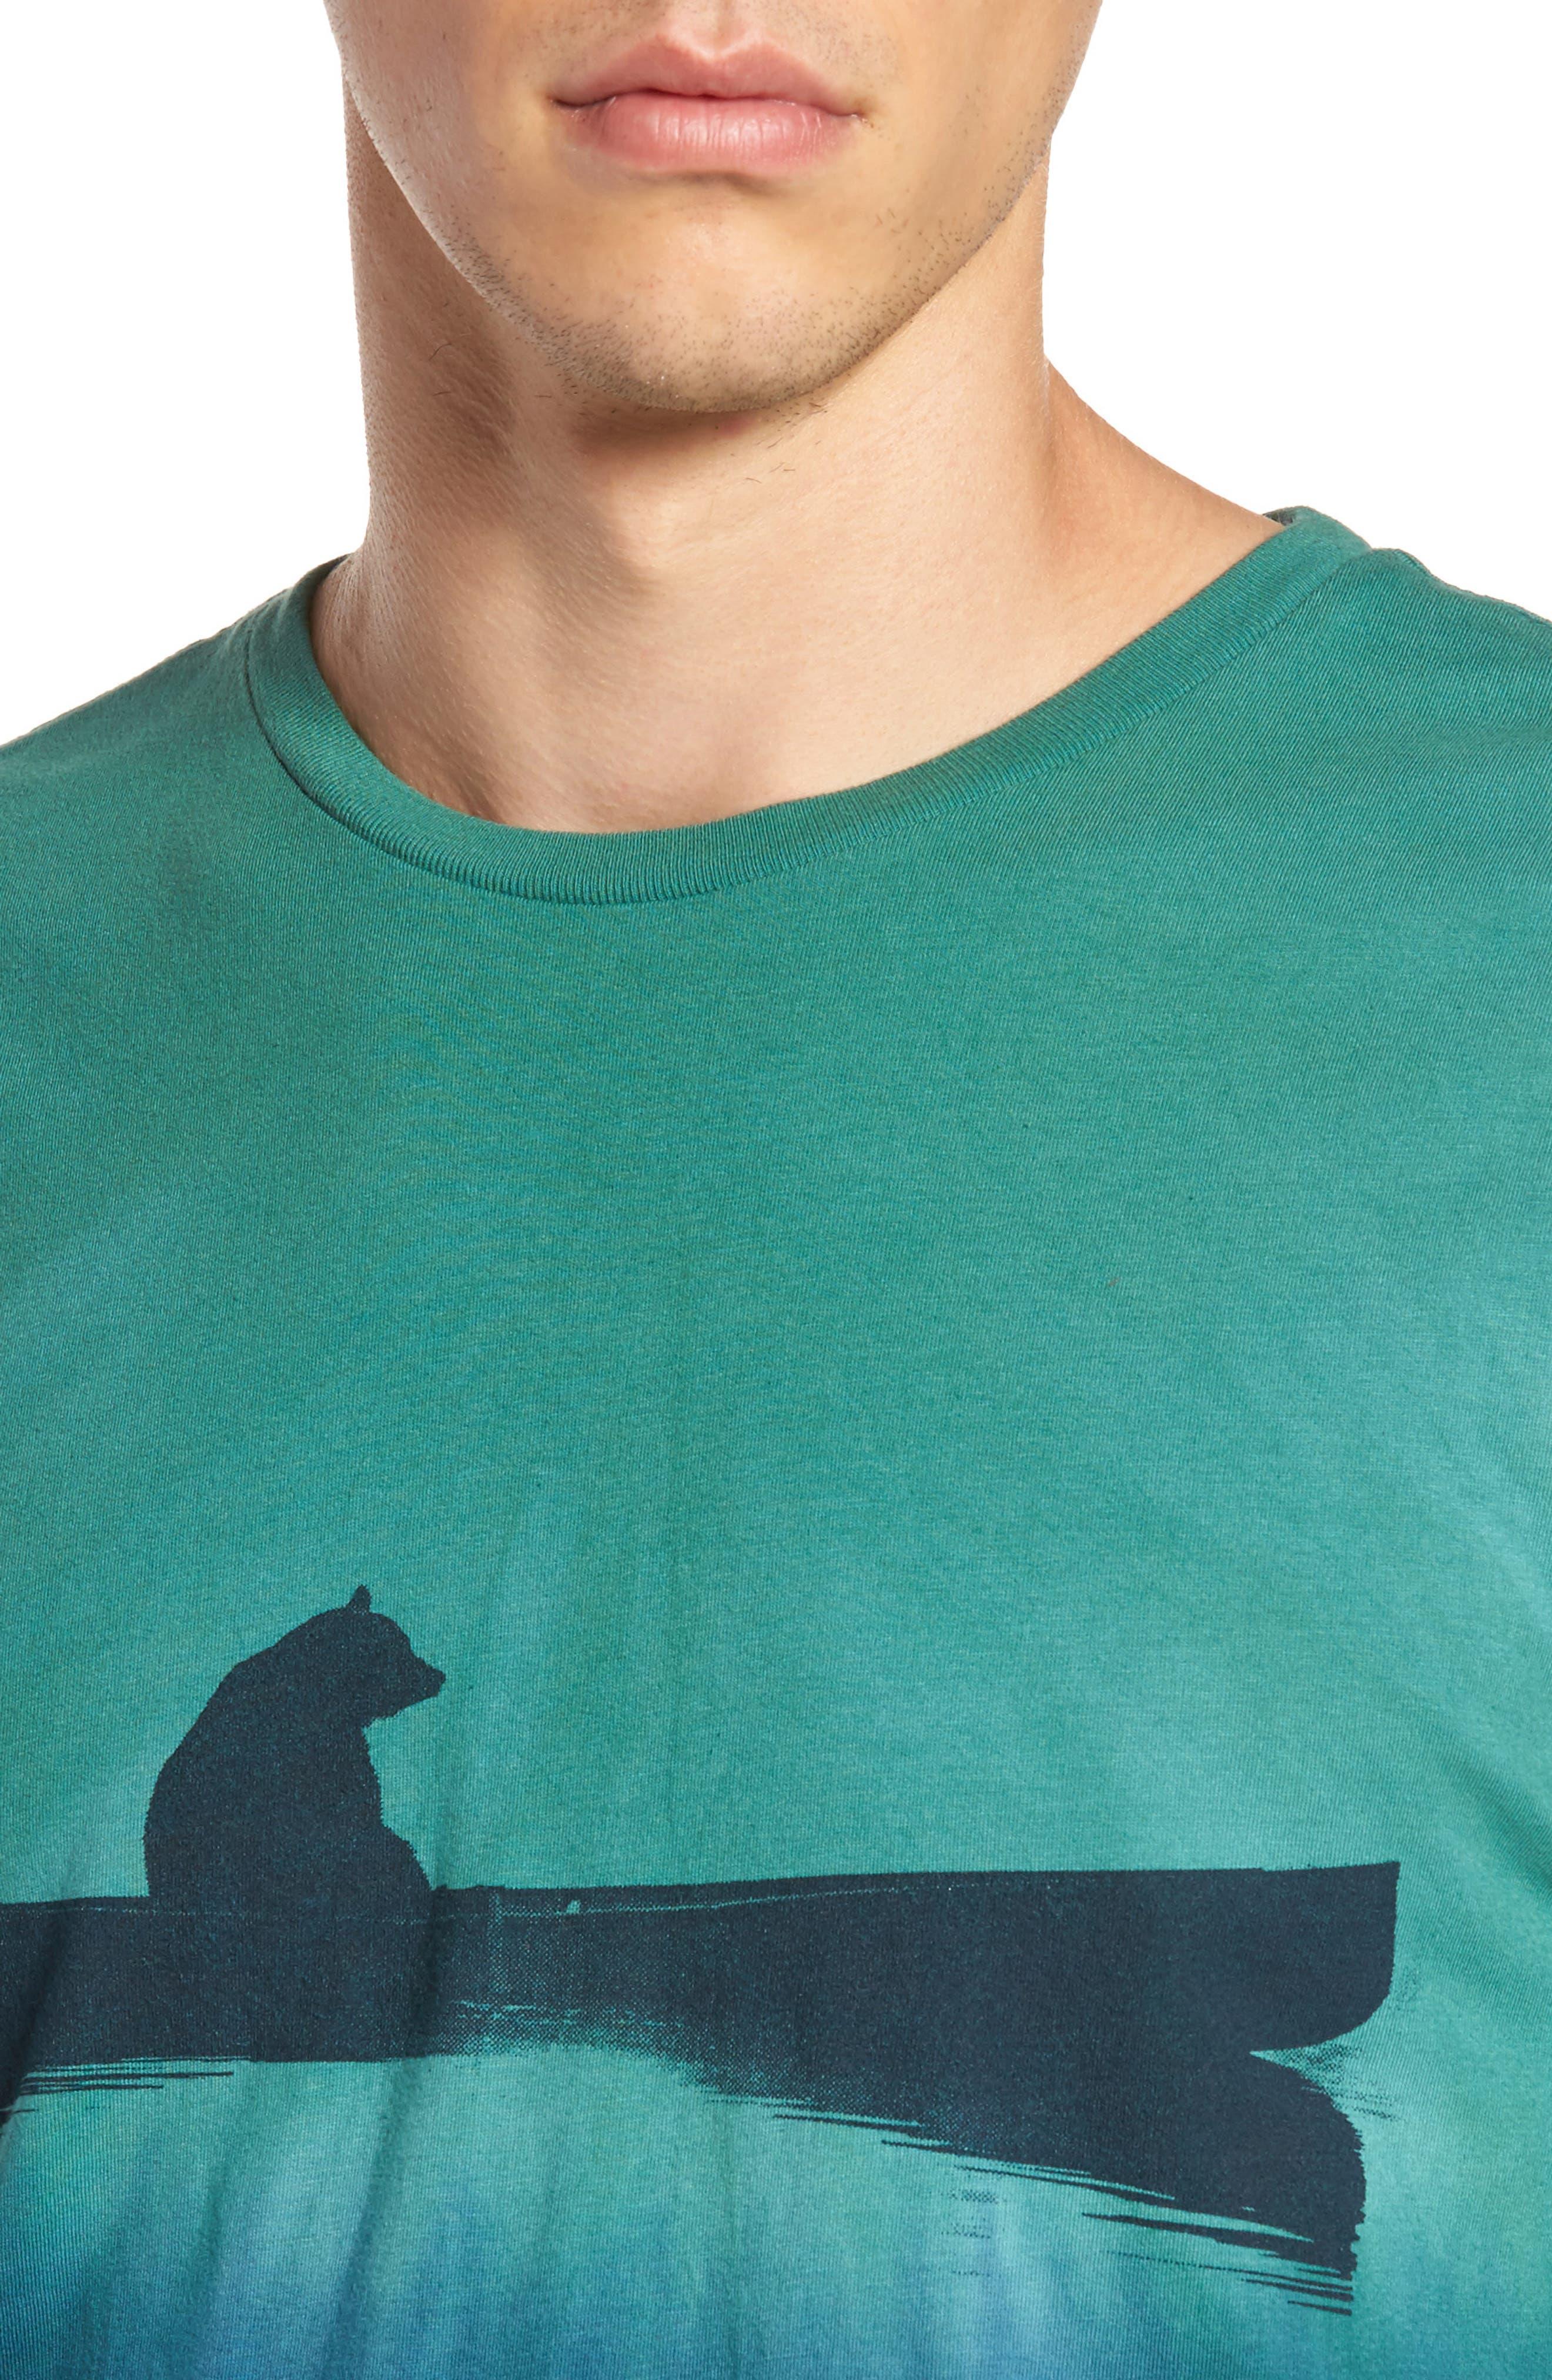 Up a Creek T-Shirt,                             Alternate thumbnail 4, color,                             ALGAE/ NAVY